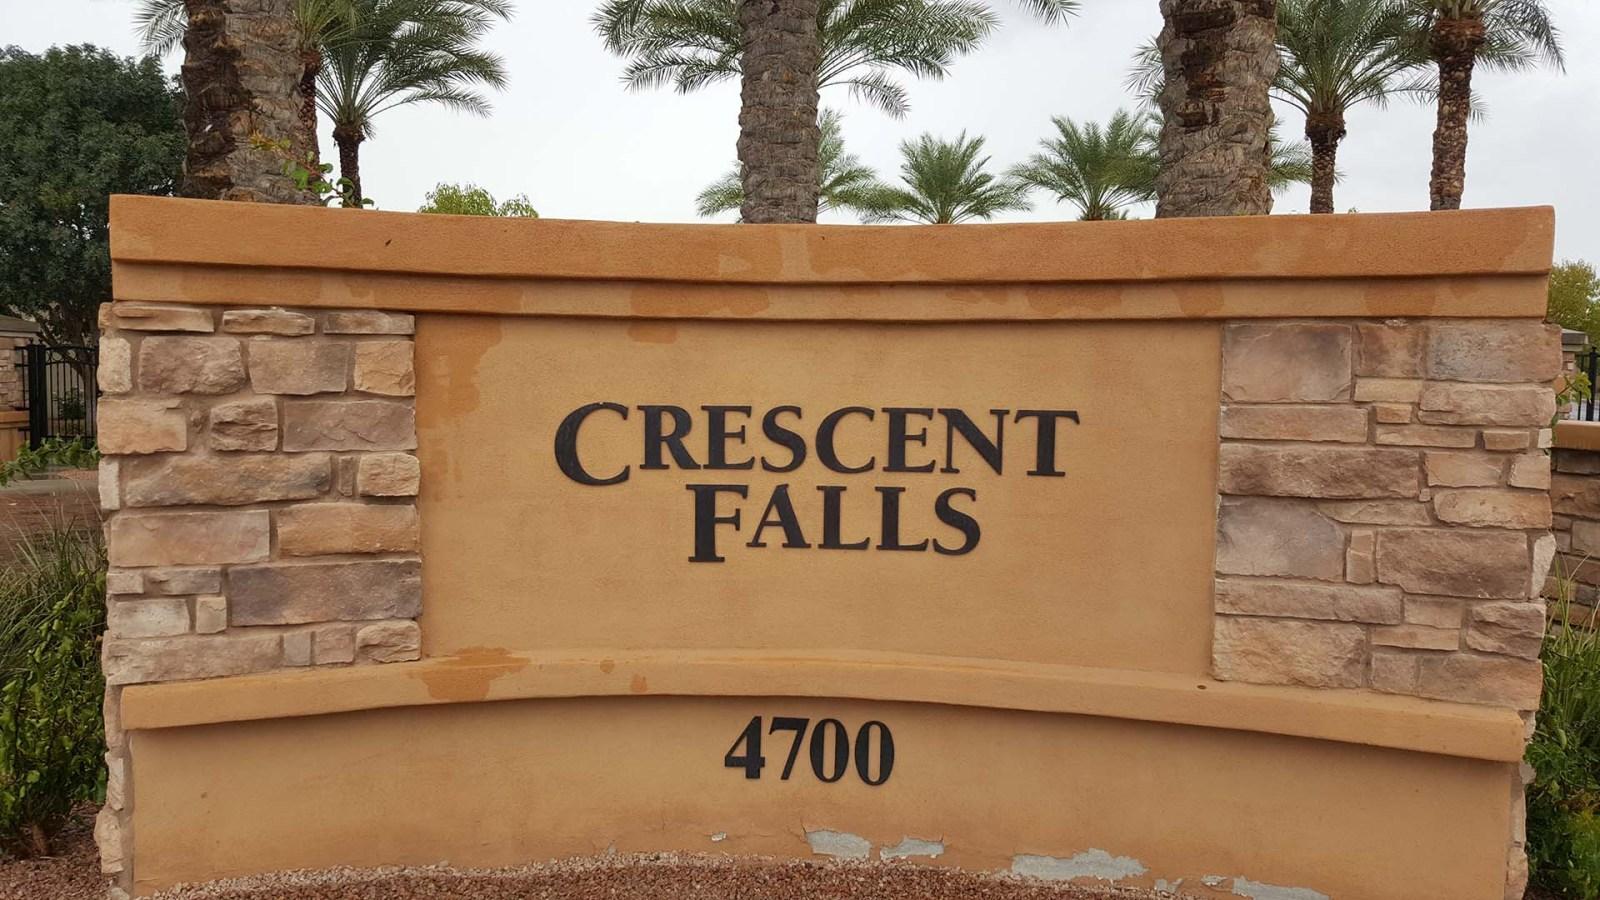 Crescent Falls in Fulton Ranch